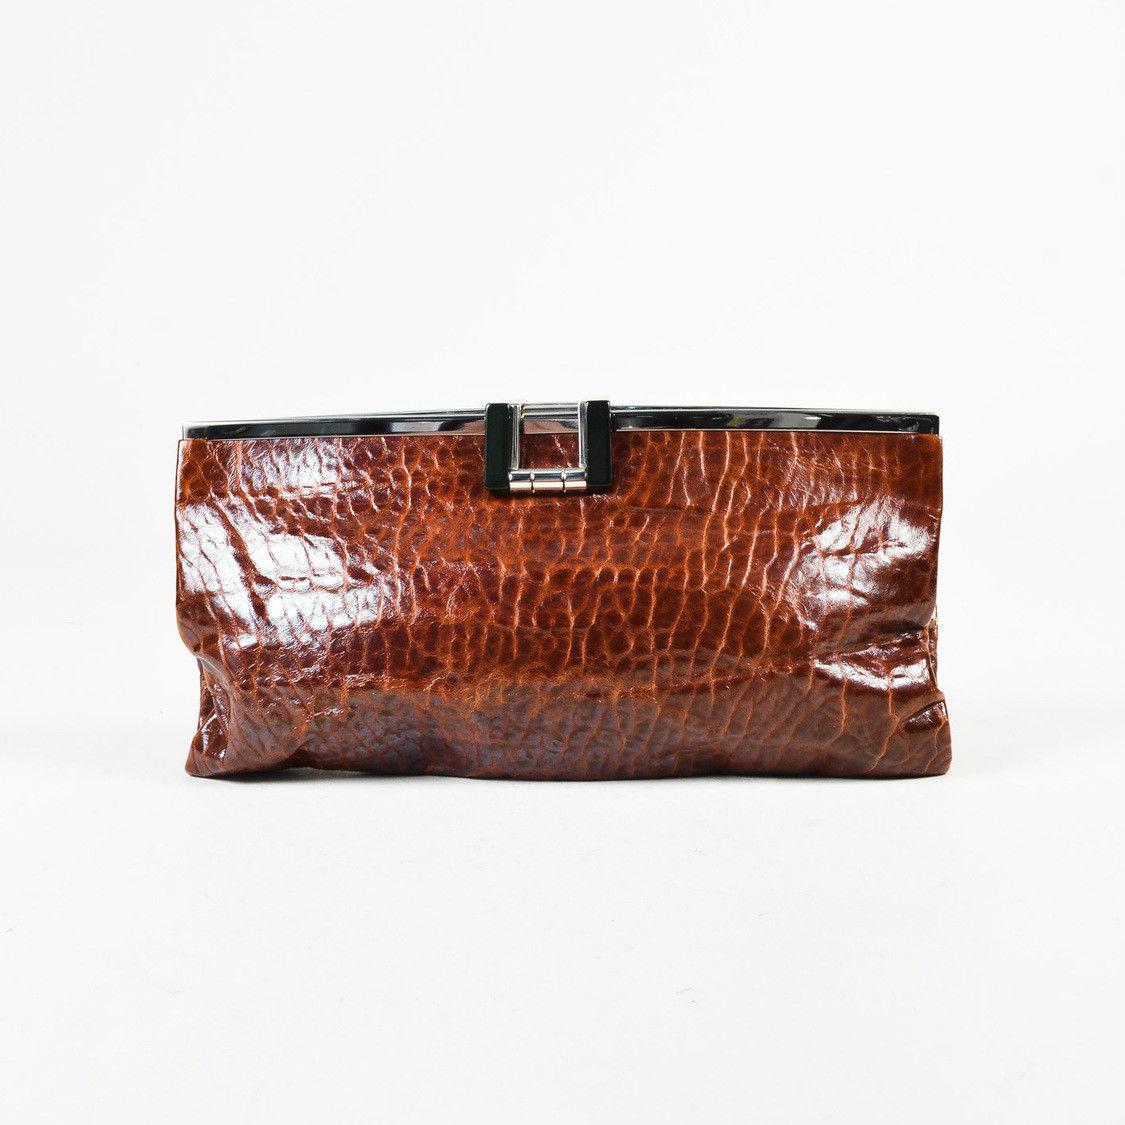 423d1a4c1d6c41 Marni Brown Leather Frame Clutch Bag - $175.00